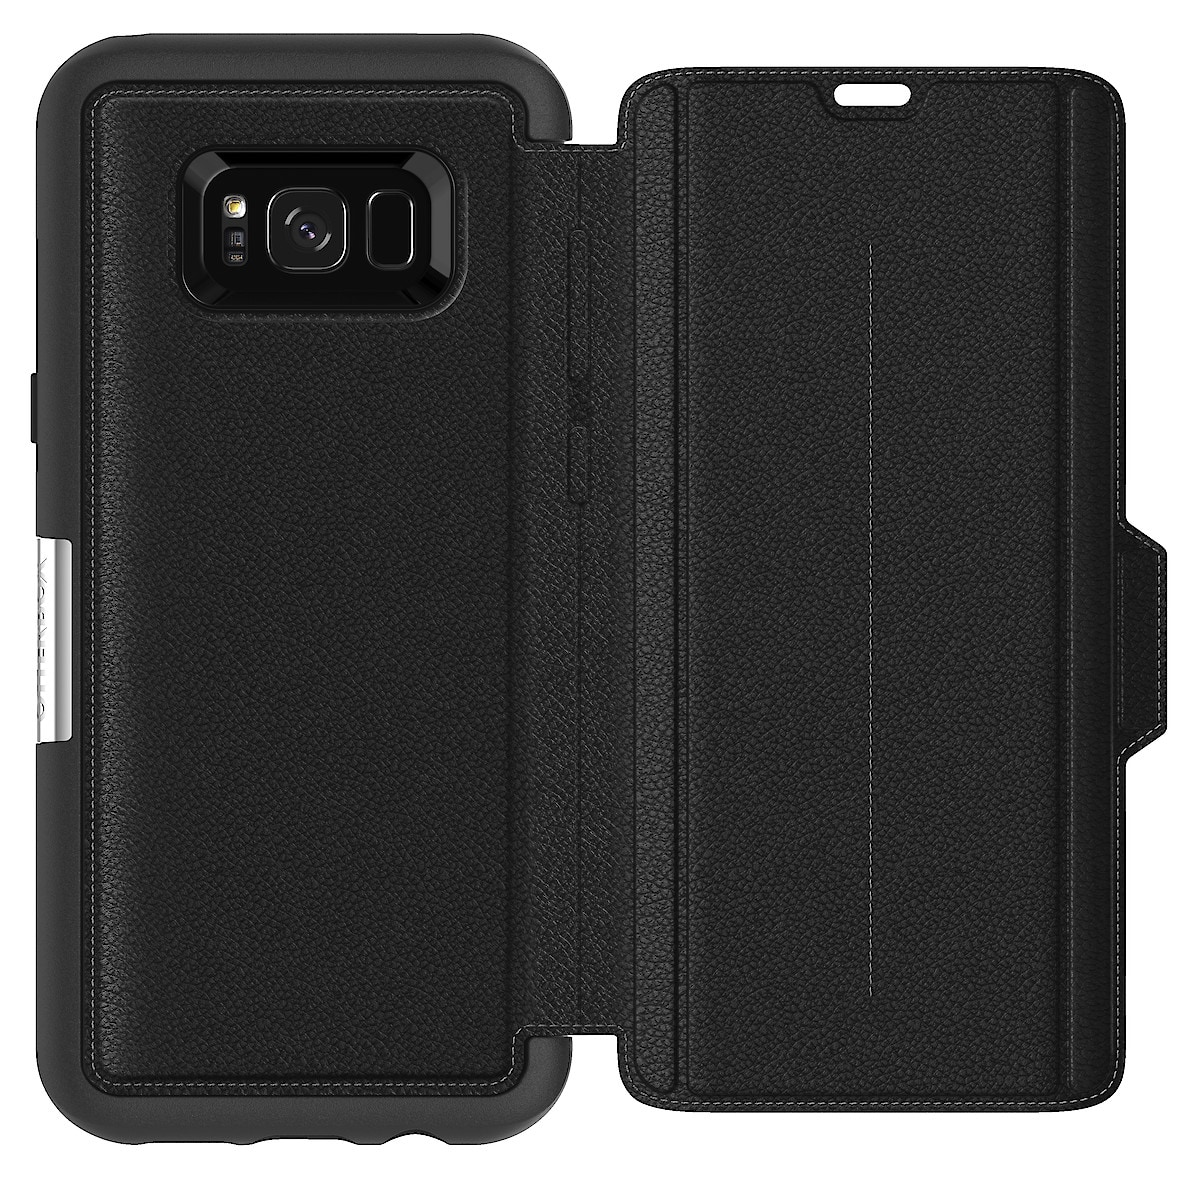 Otterbox Strada Edge Protective Case for Samsung Galaxy S8 Plus